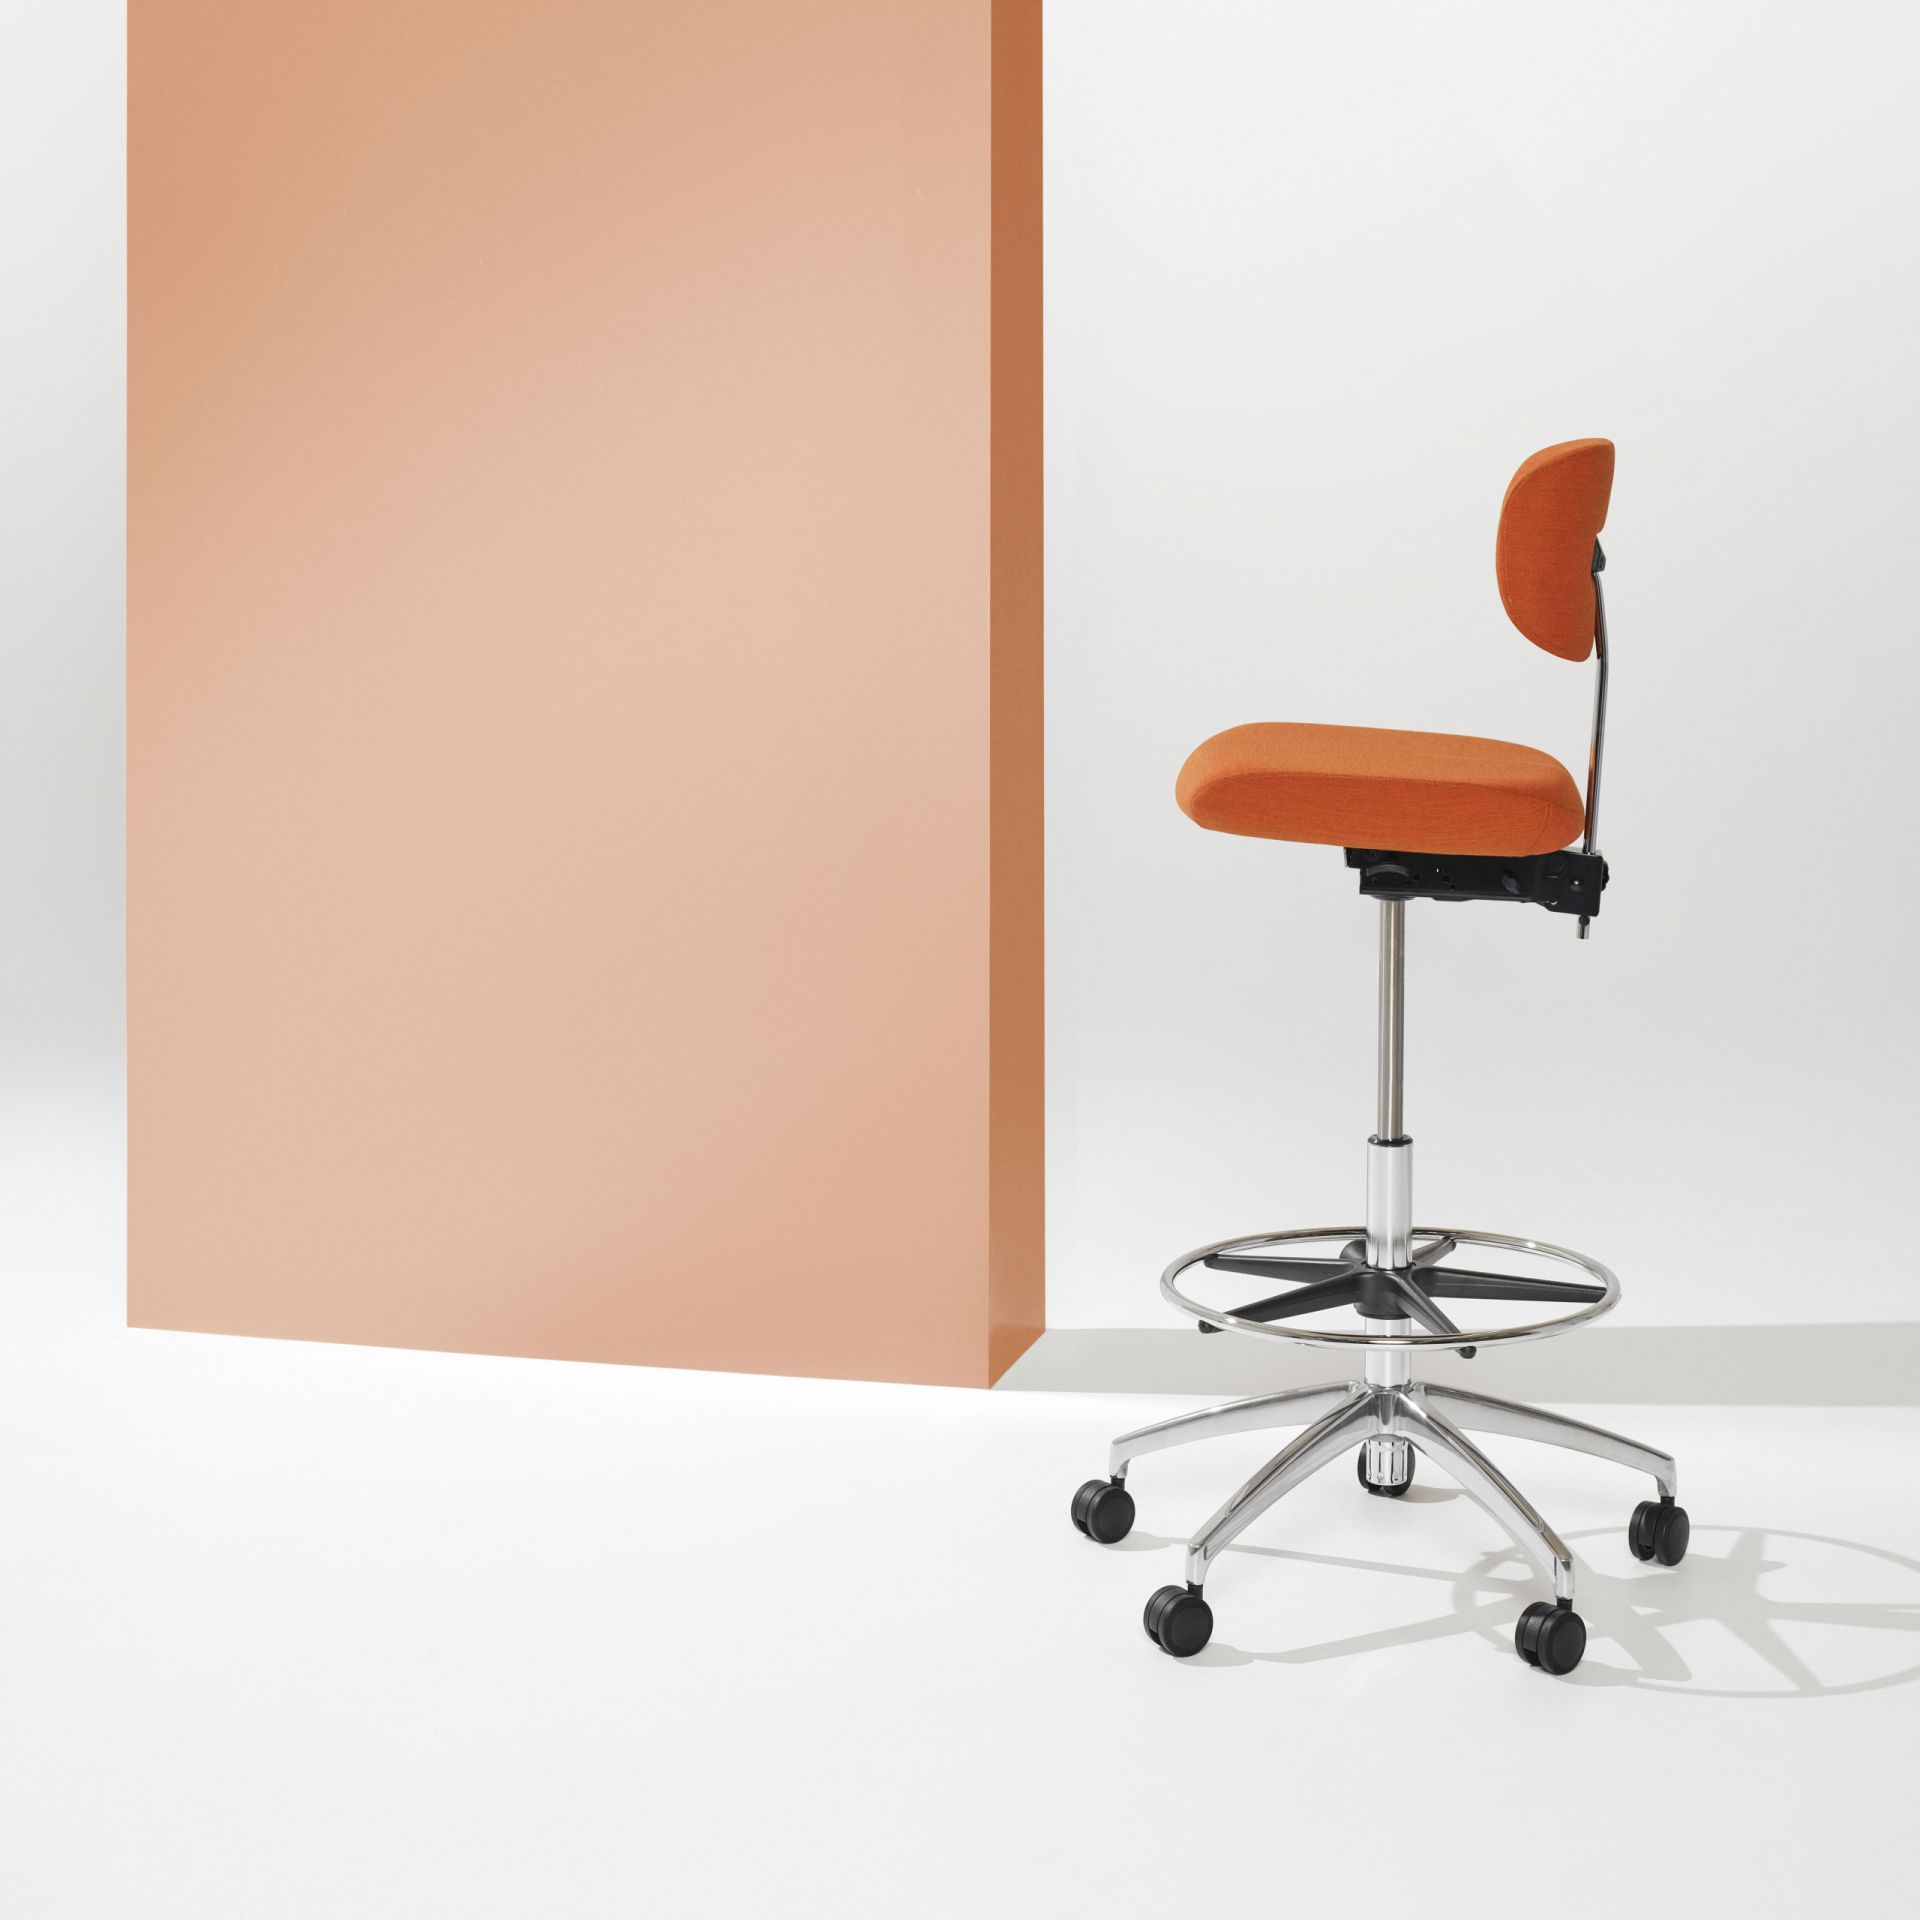 Savo Studio Studio hög stol produktbild 2